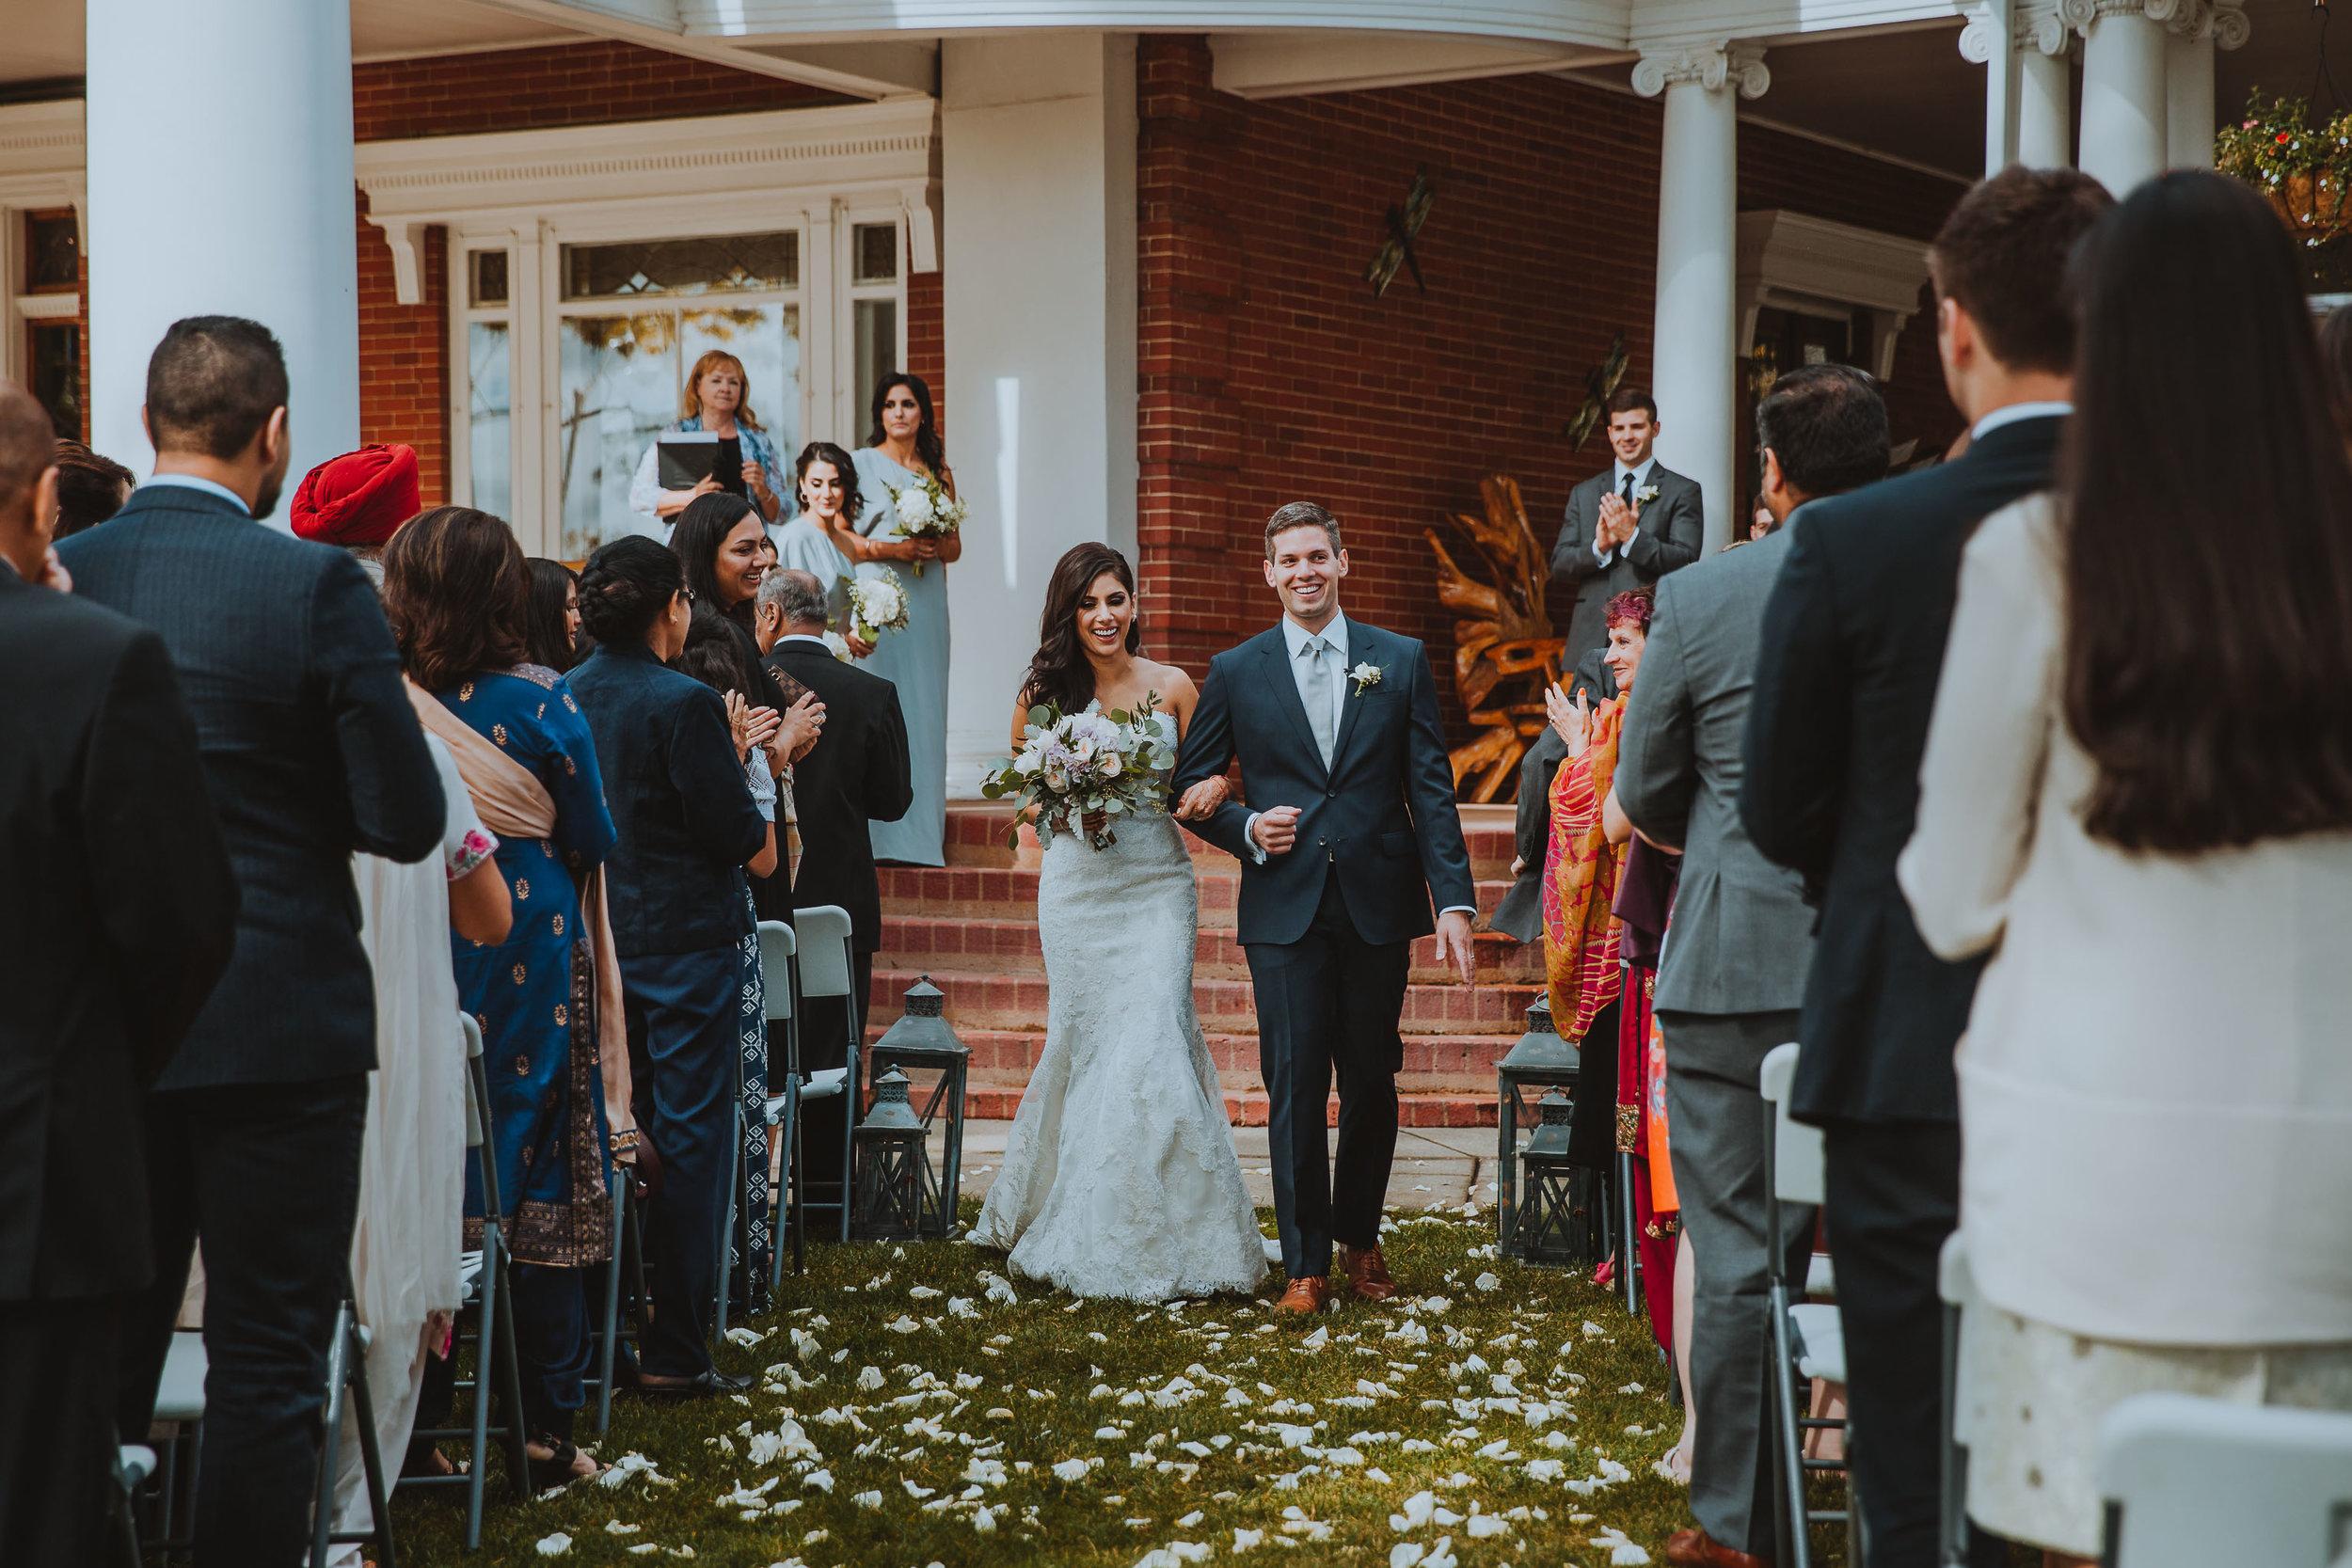 GH Photography Edmontnon Wedding Photographers Magrath Mansion Indian Wedding.jpg